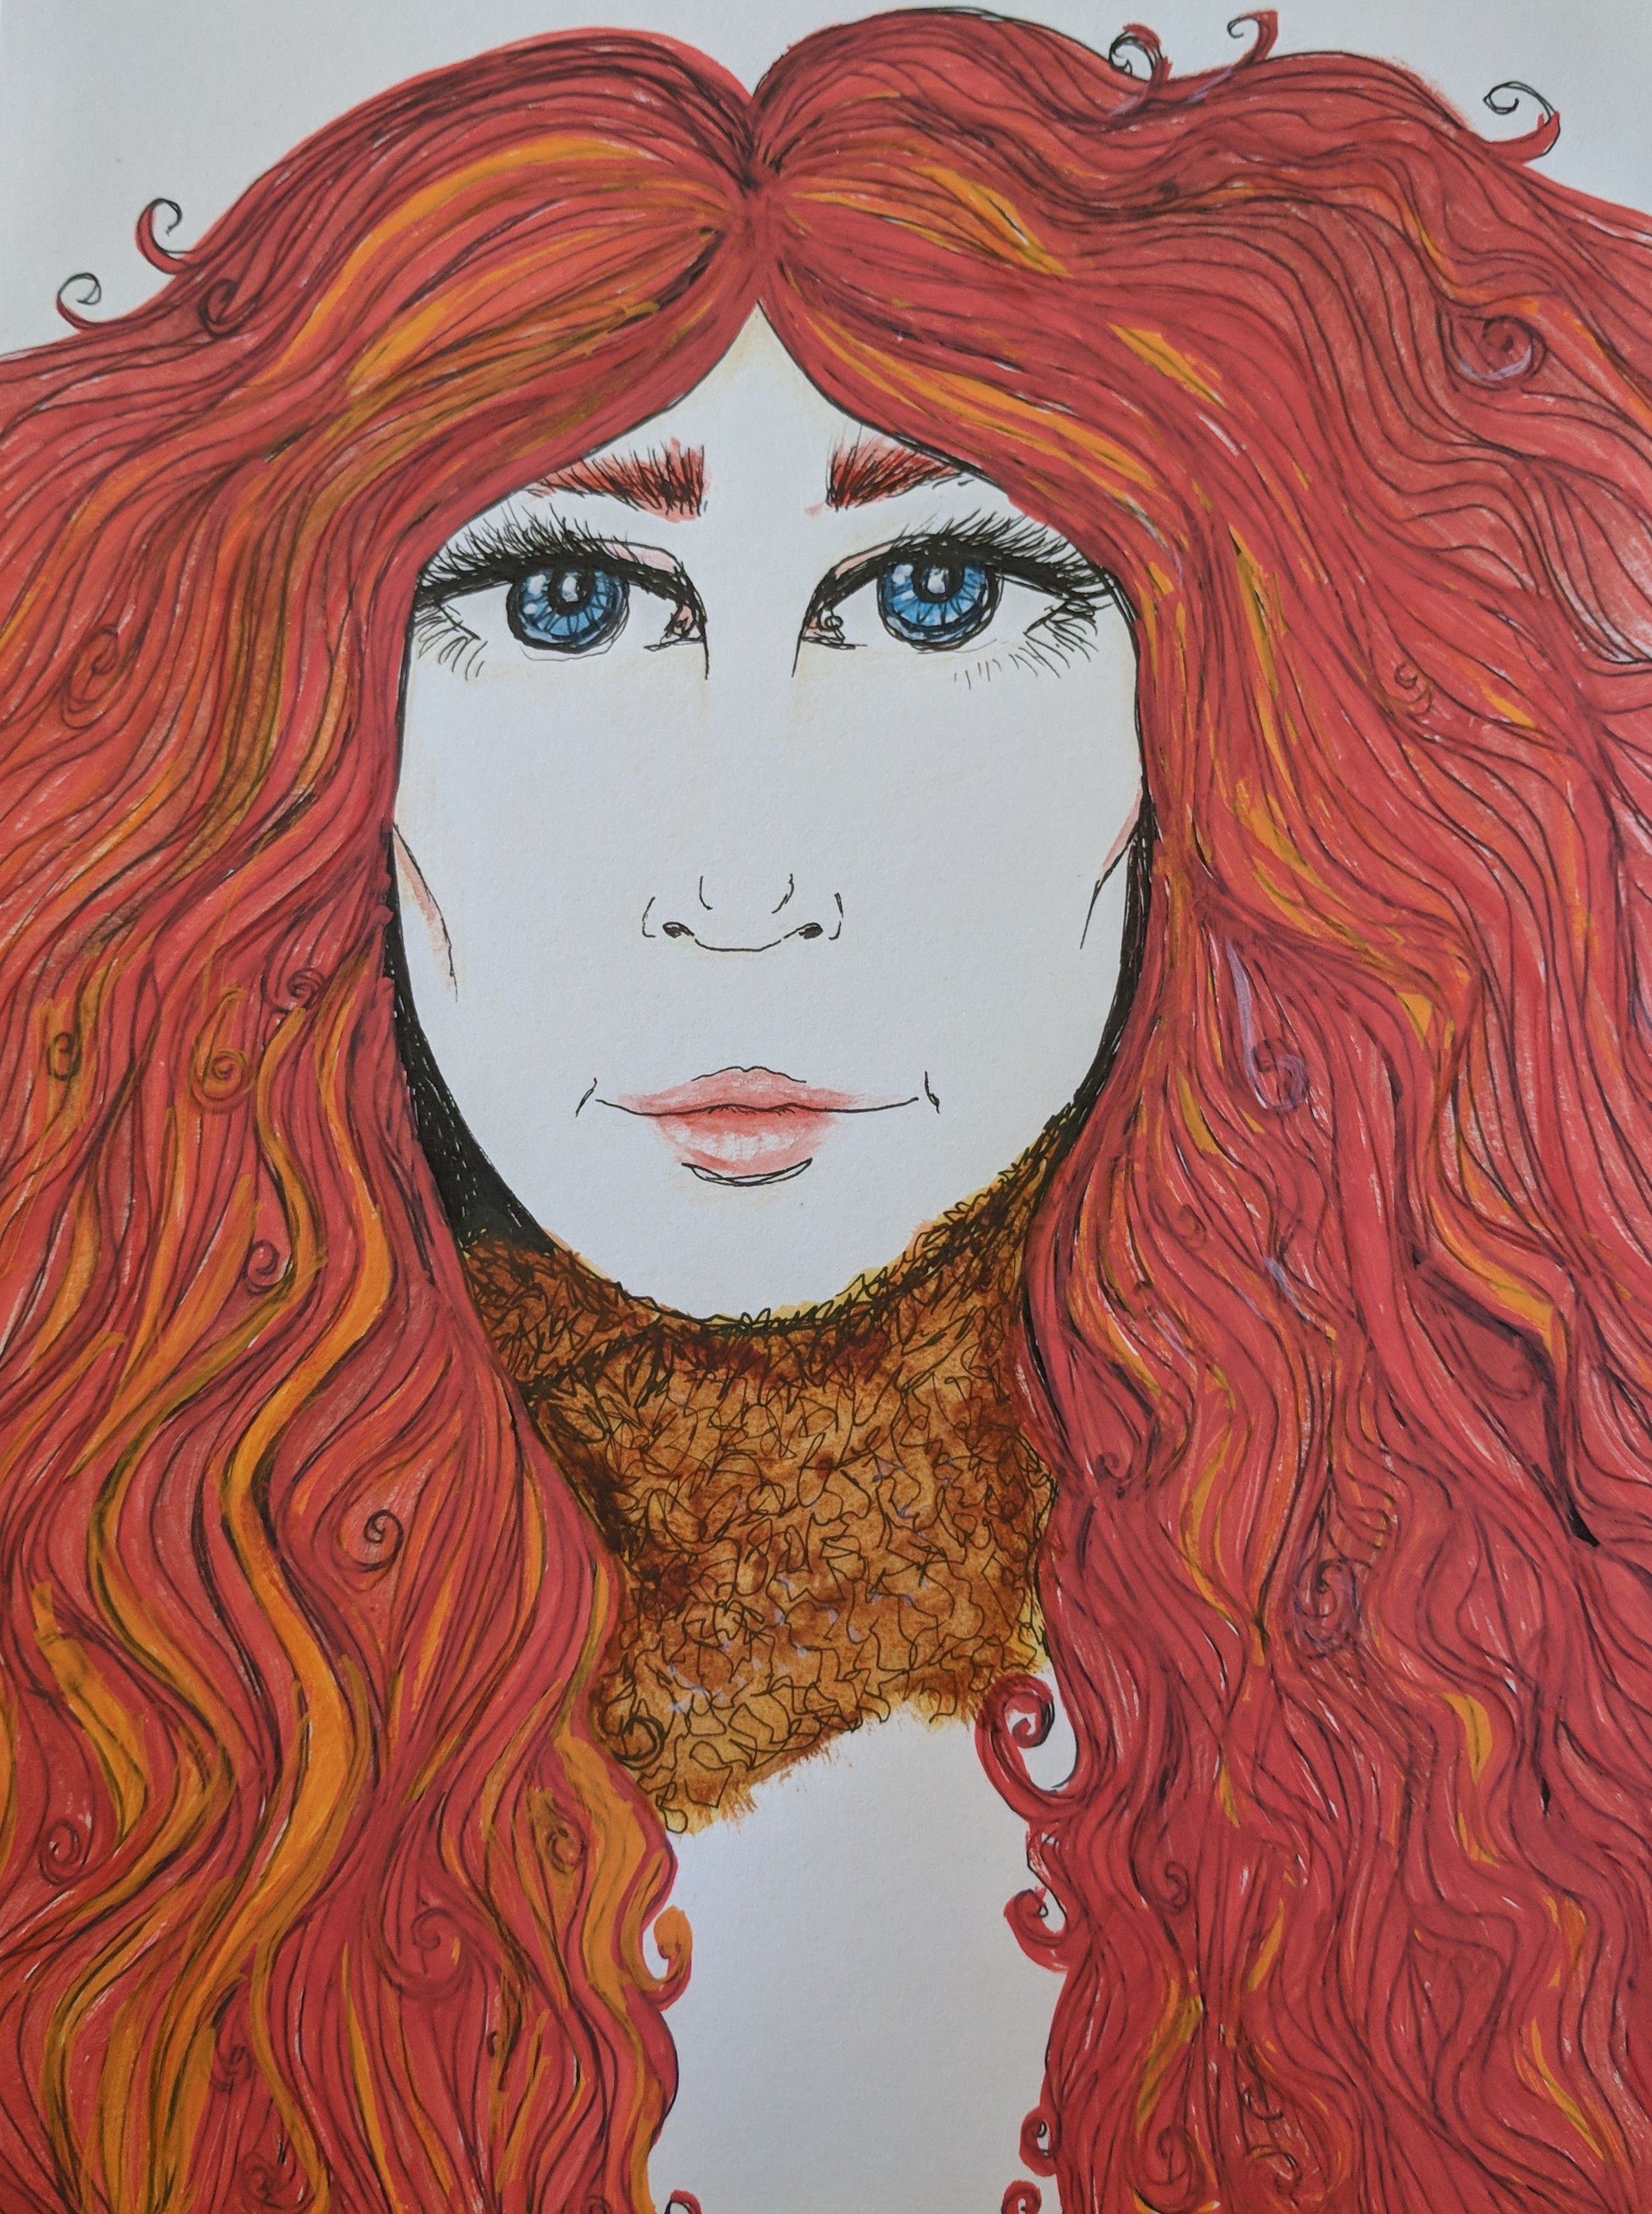 Goddess Eir by Rachel Keene